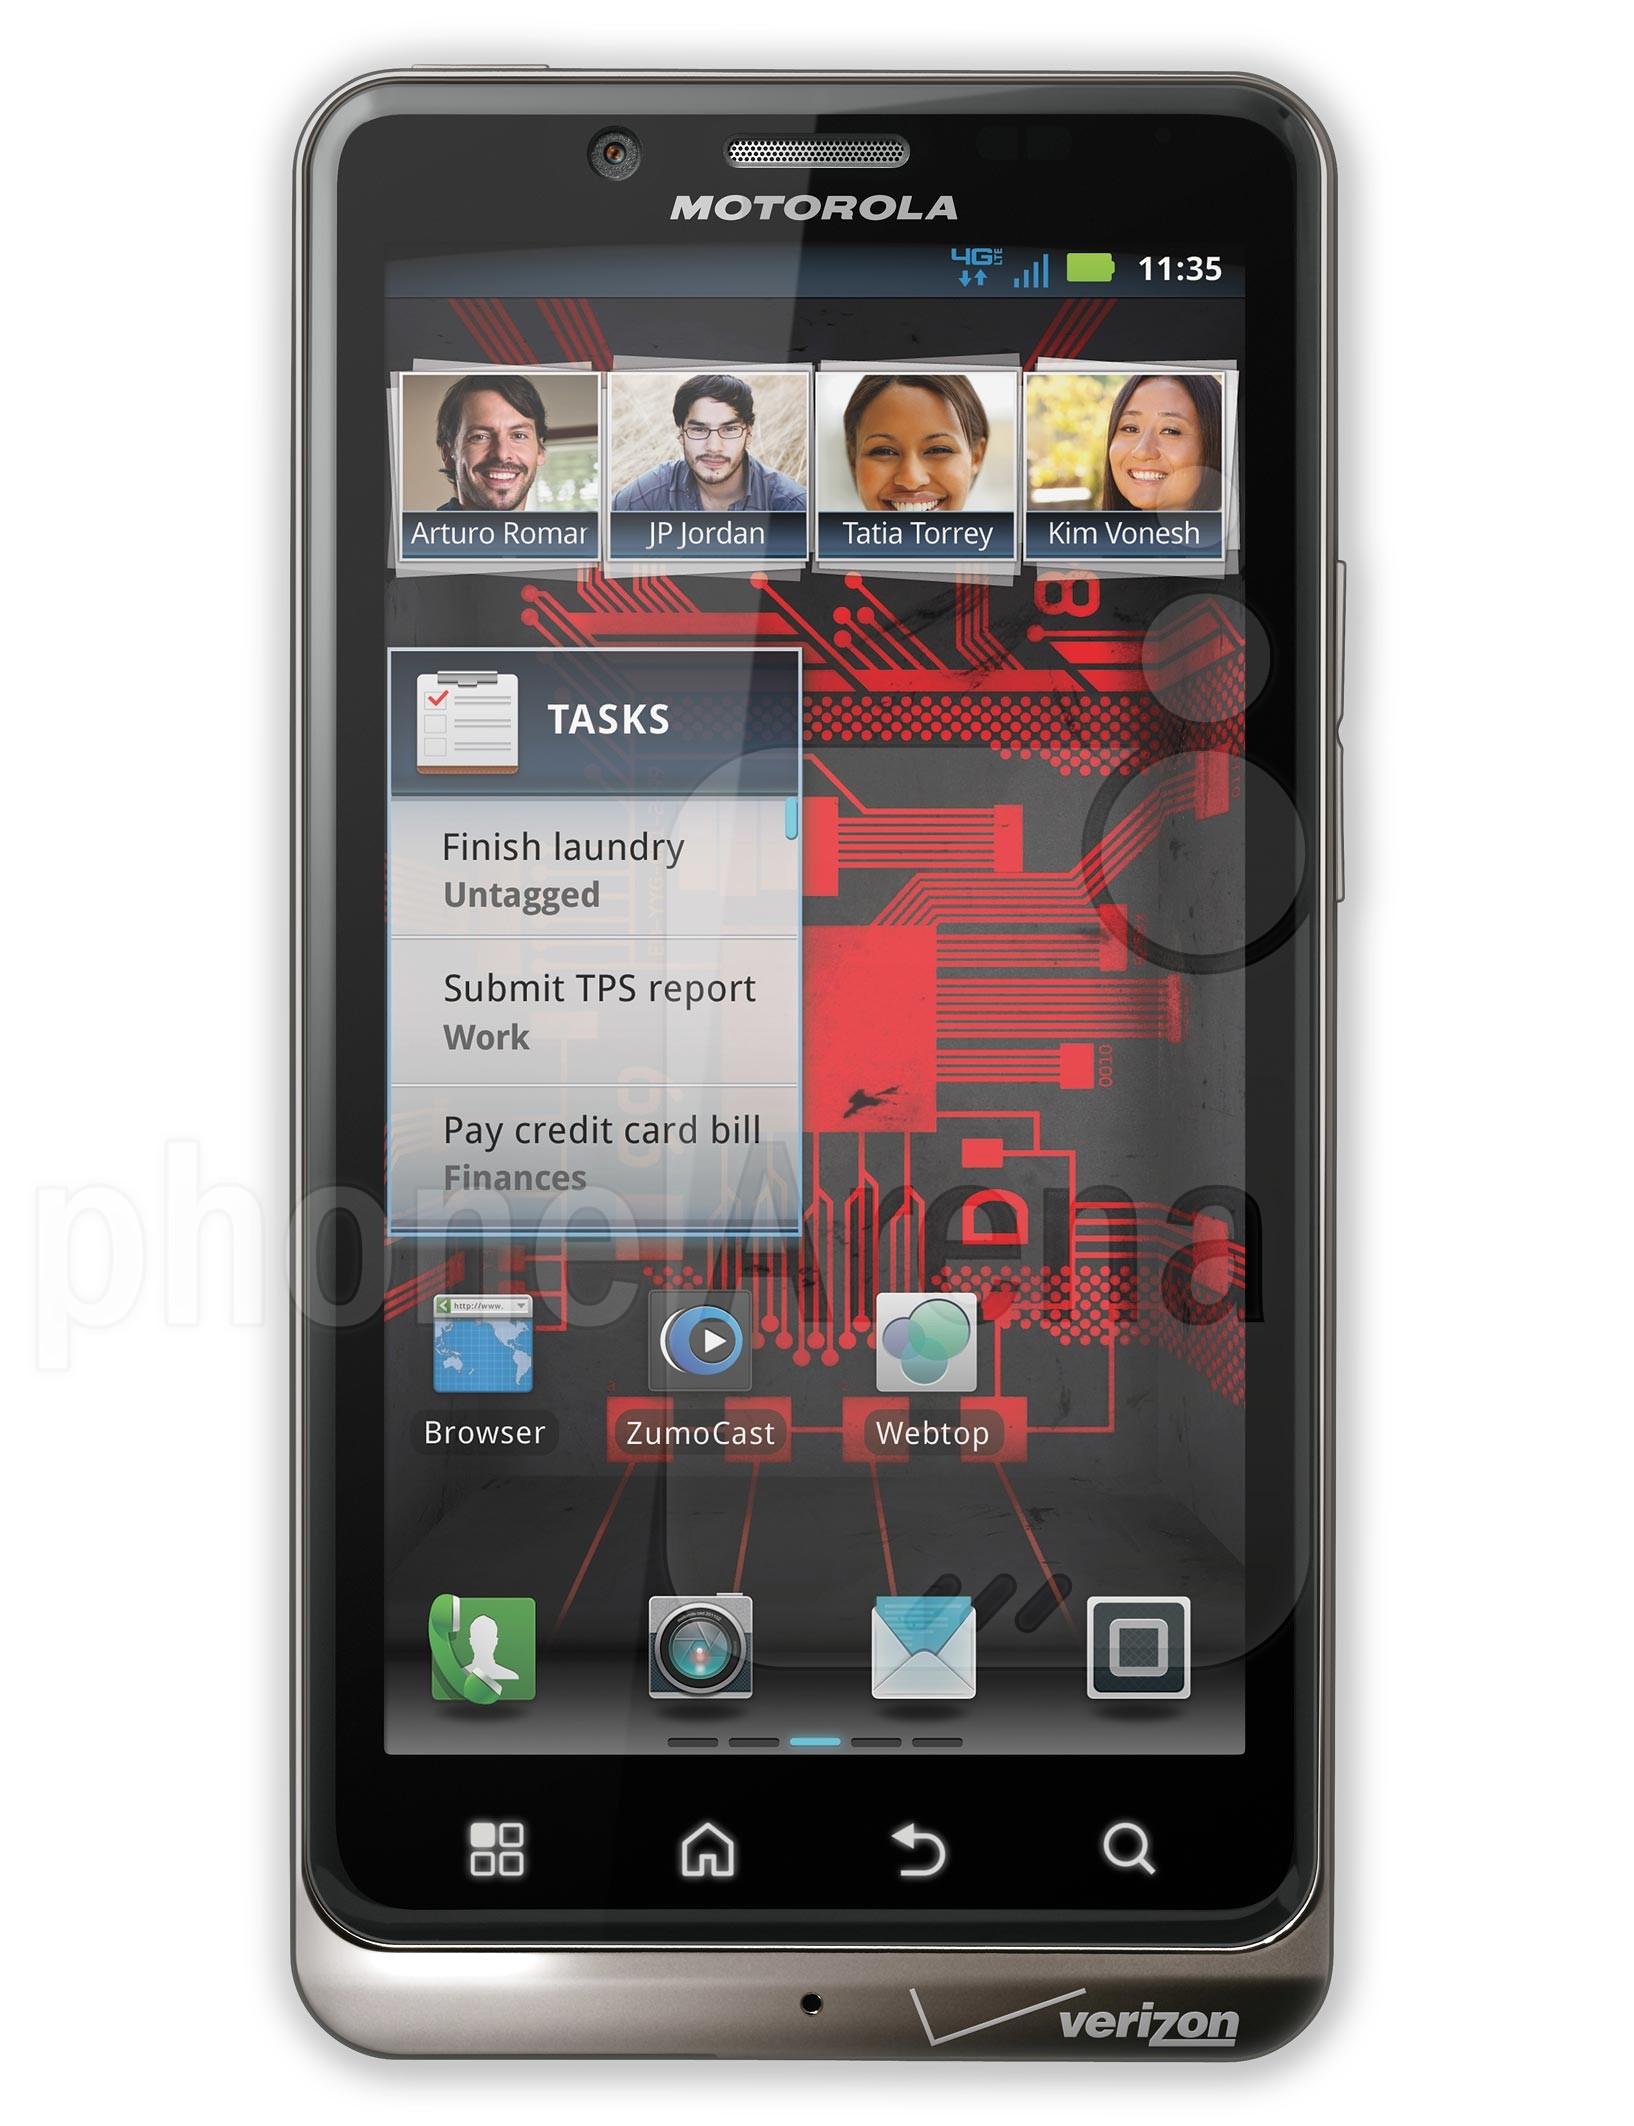 Motorola DROID BIONIC specs